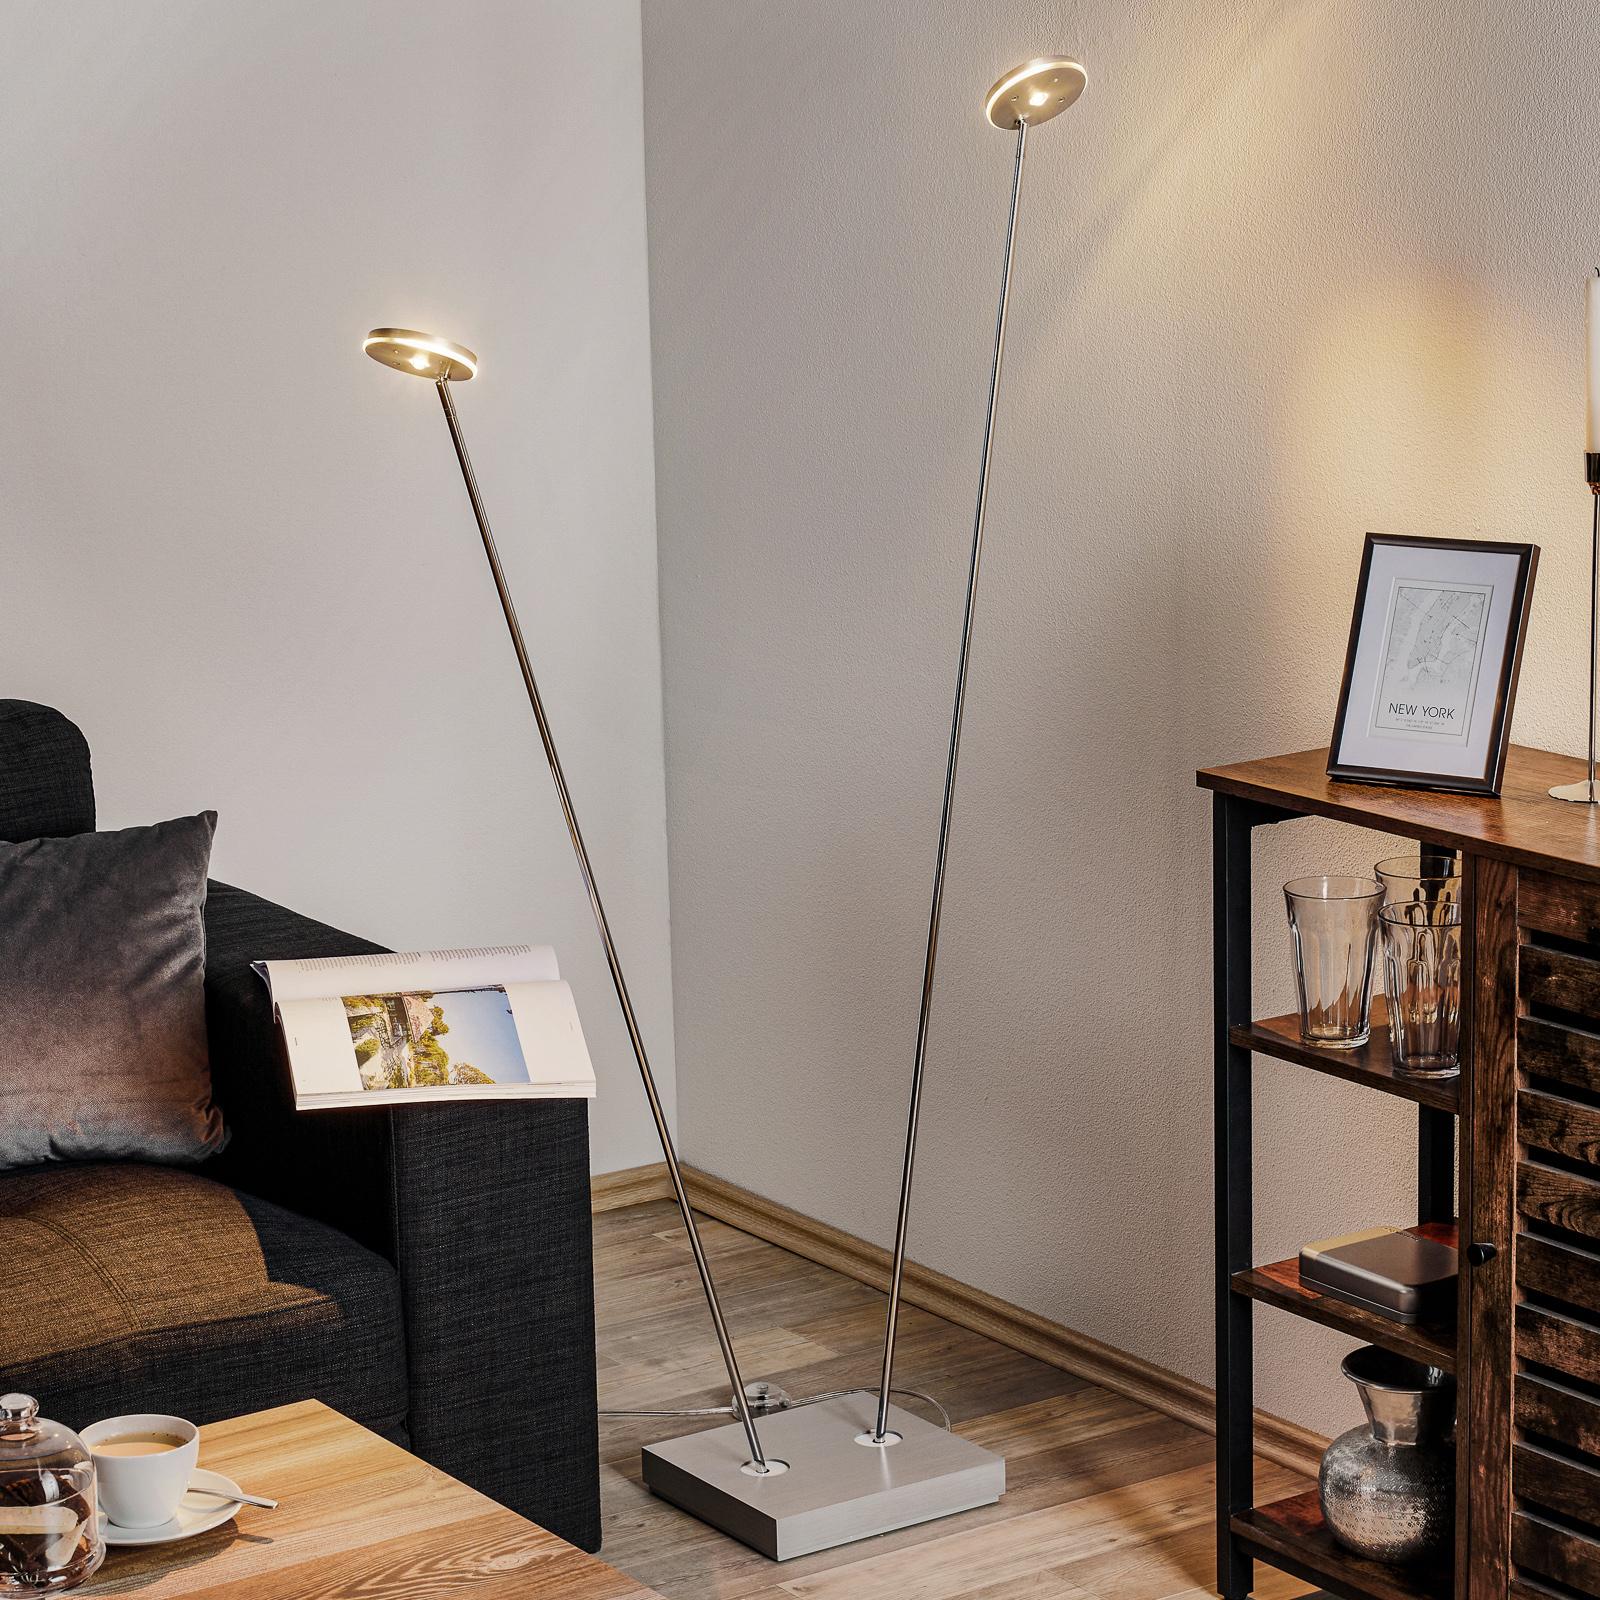 Escale Spot It – LED-gulvlampe med dimmer, 2 lys